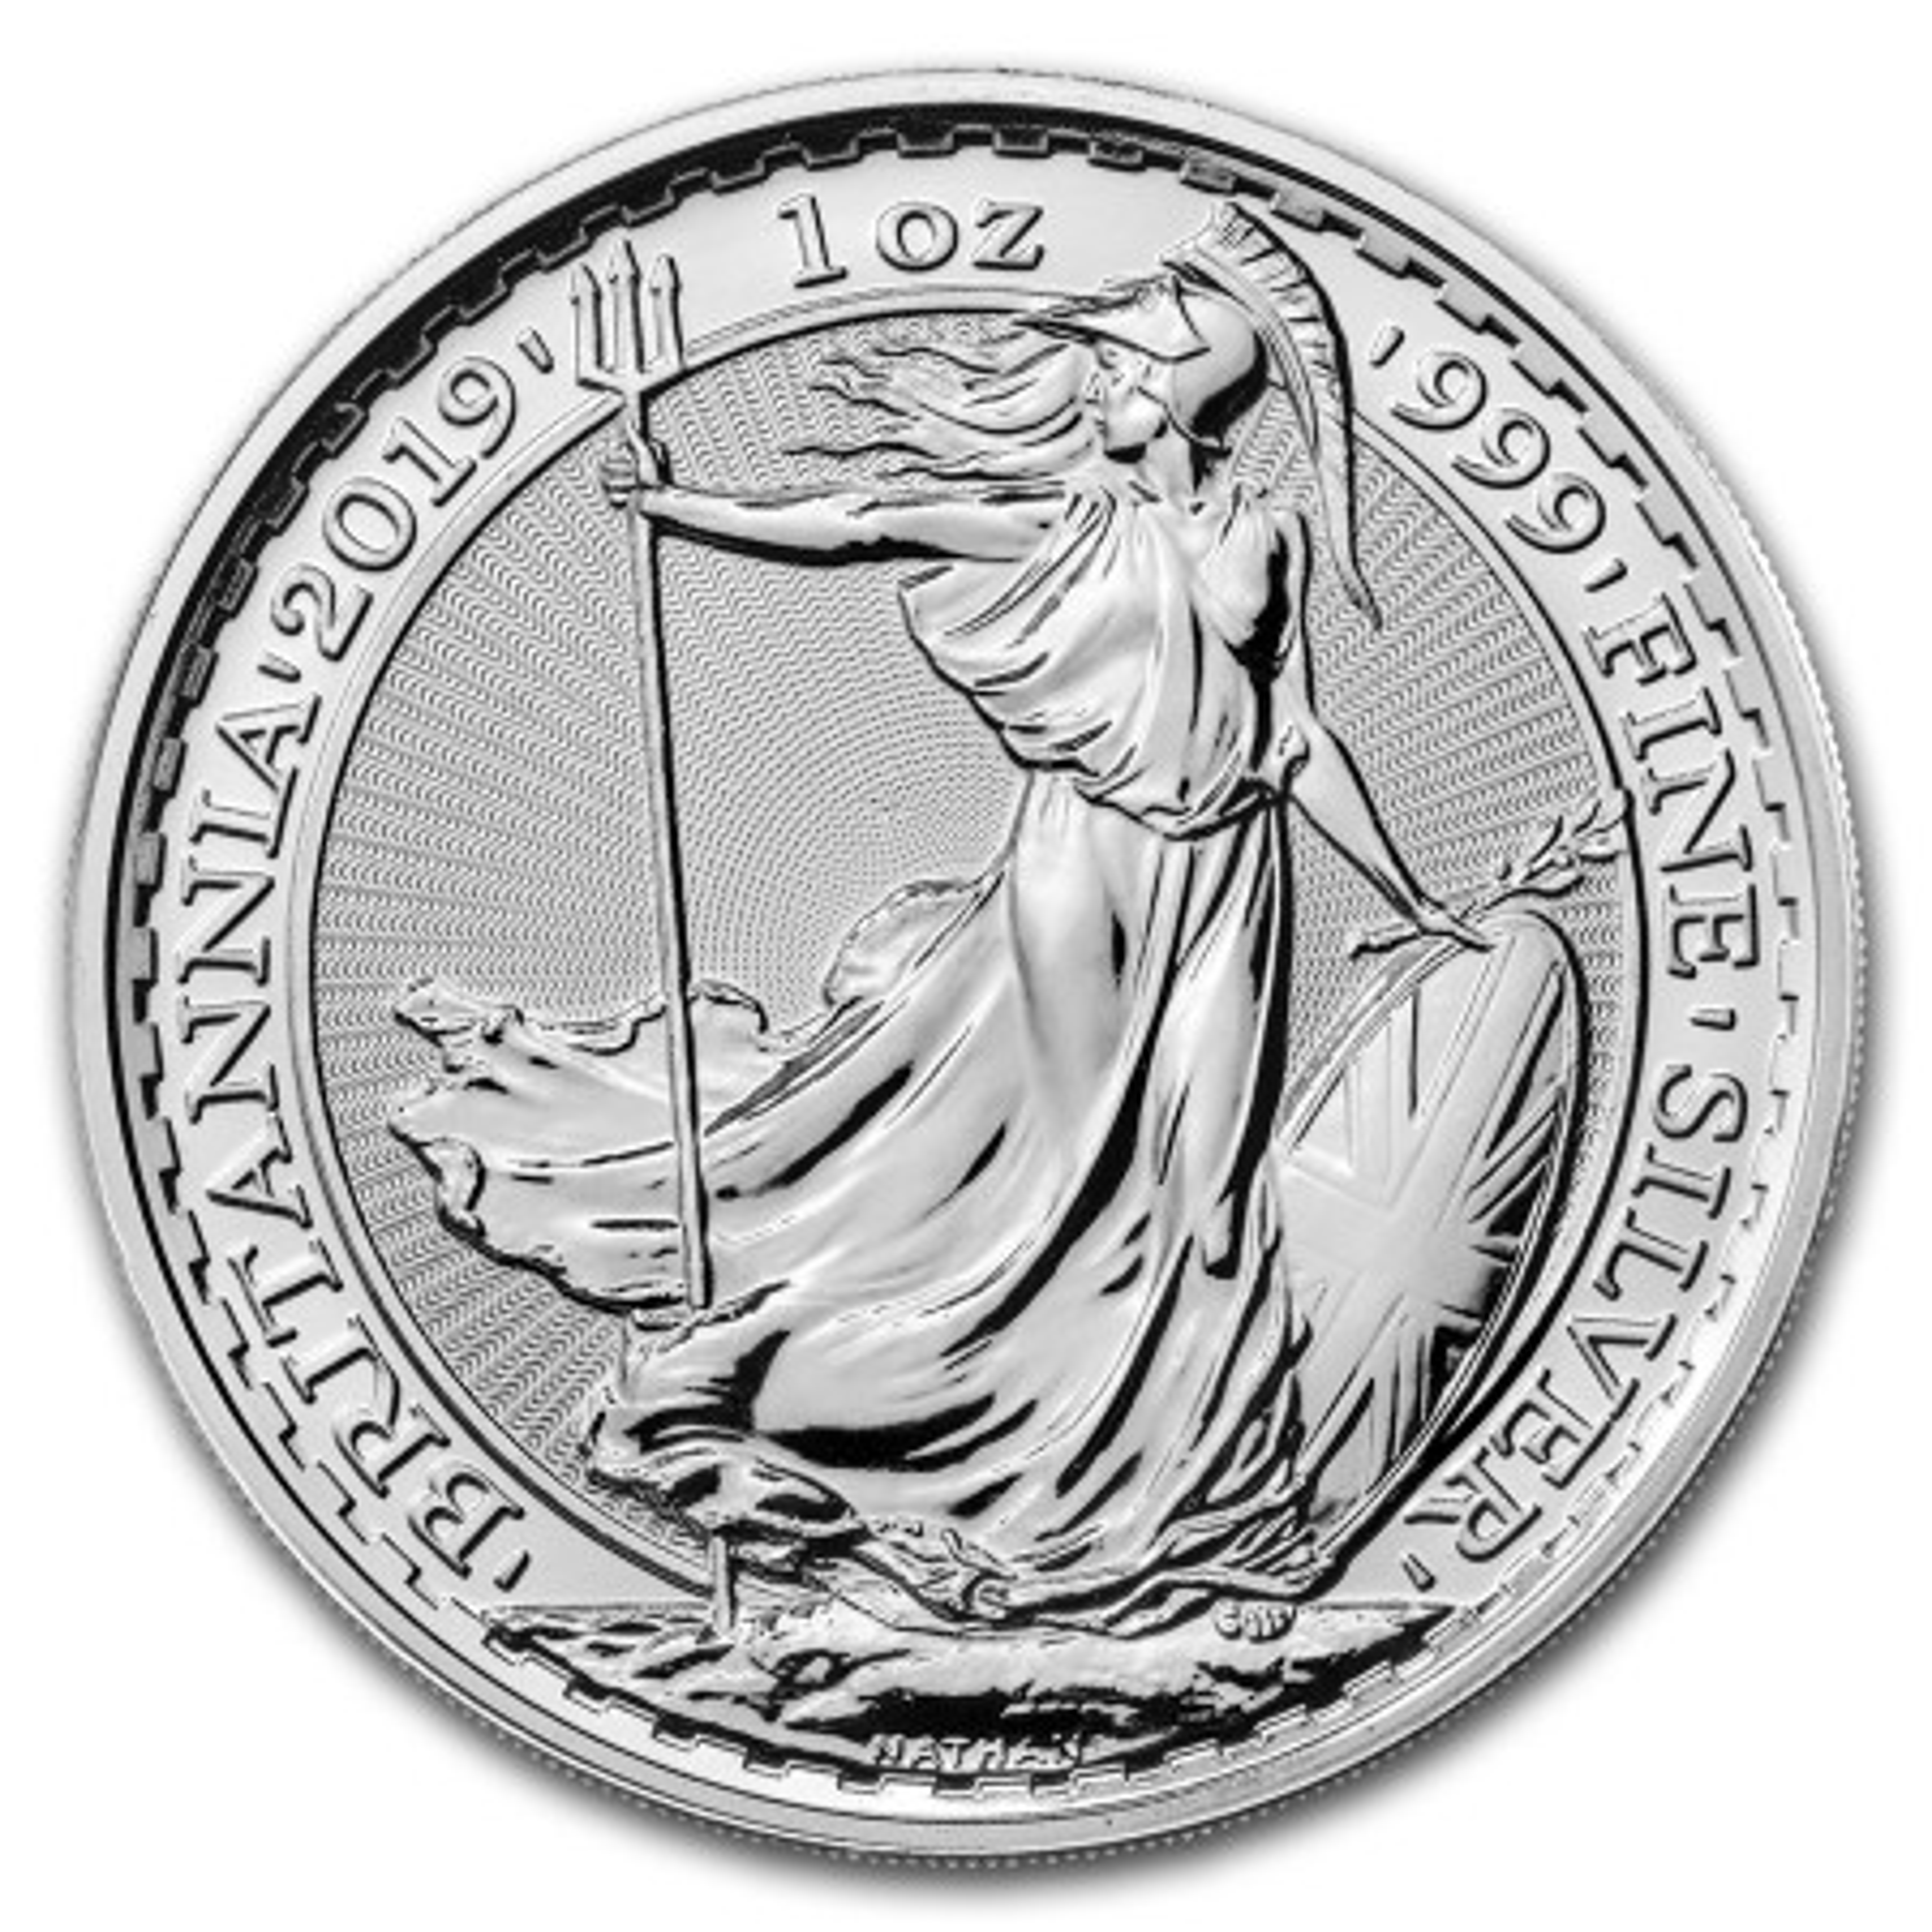 1 troy ounce zilveren munt Britannia 2019